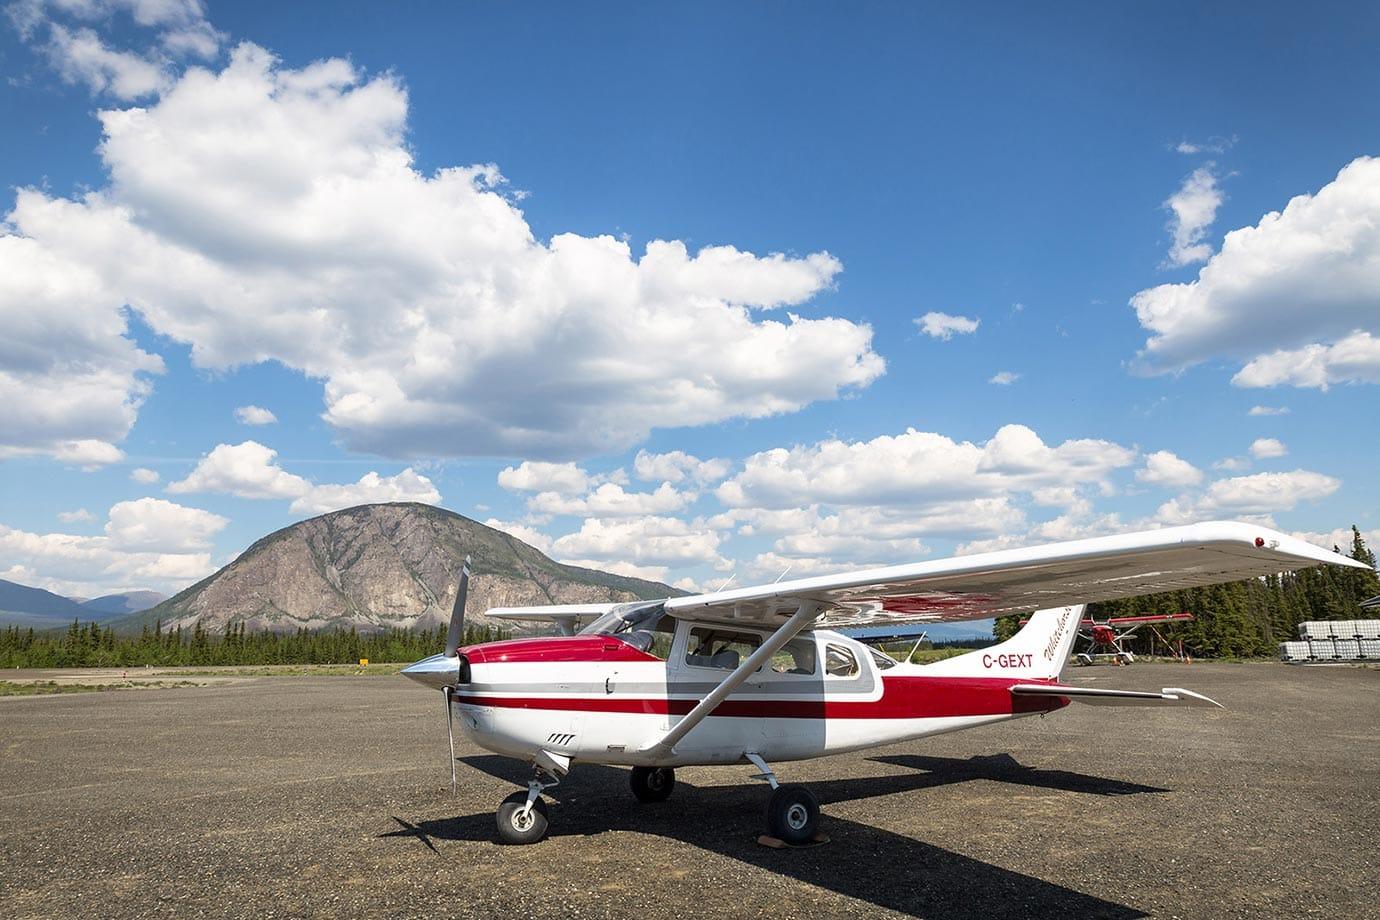 Airfield at Kluane National Park